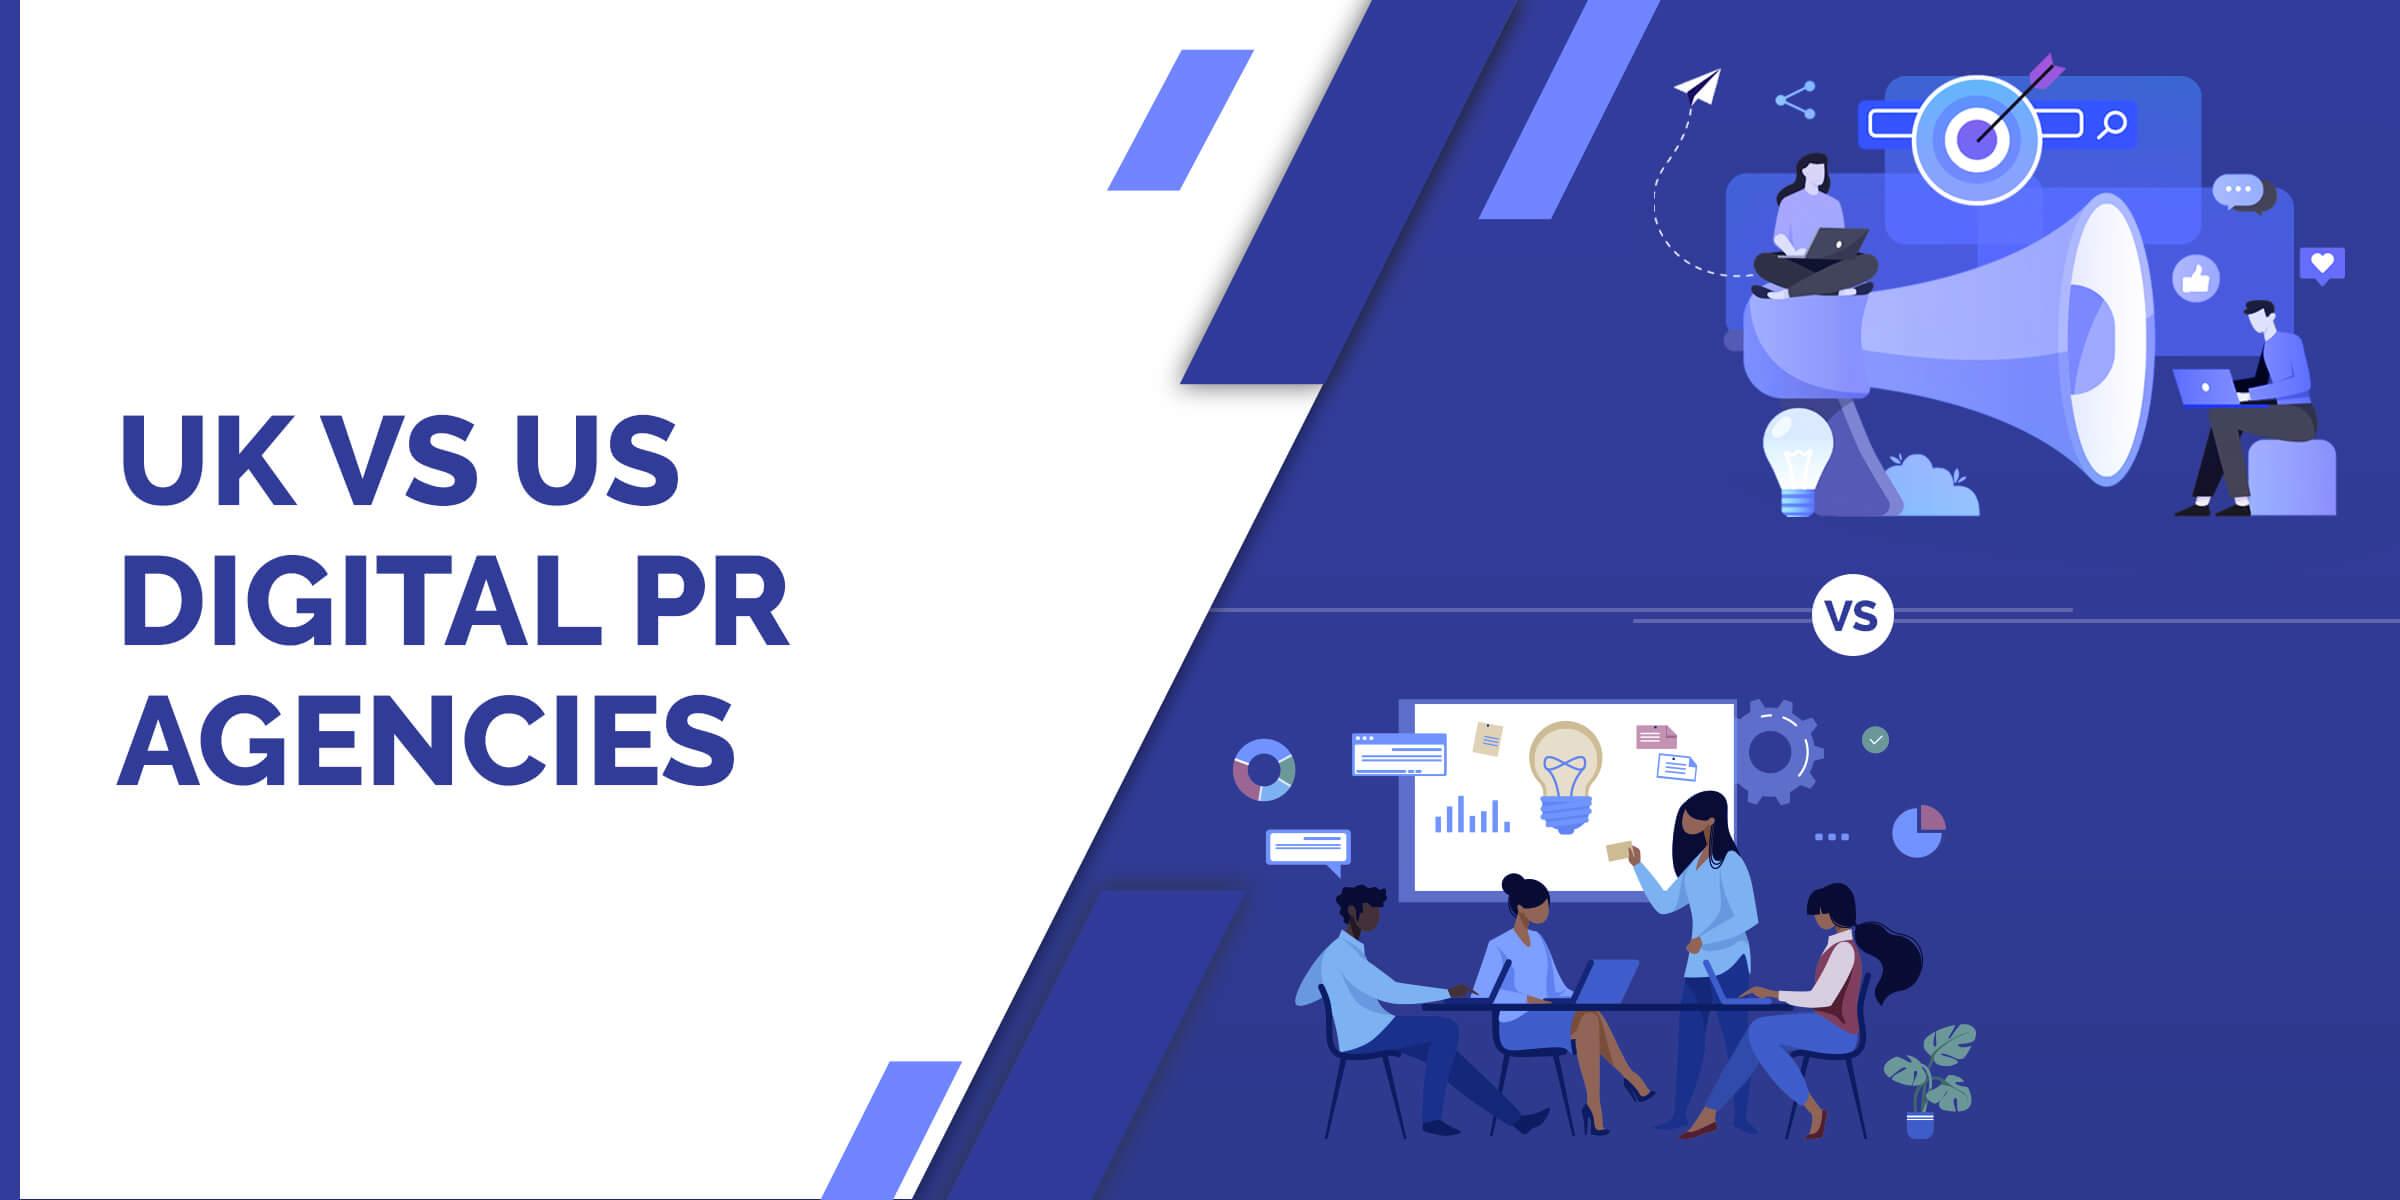 UK vs US Digital PR Agencies